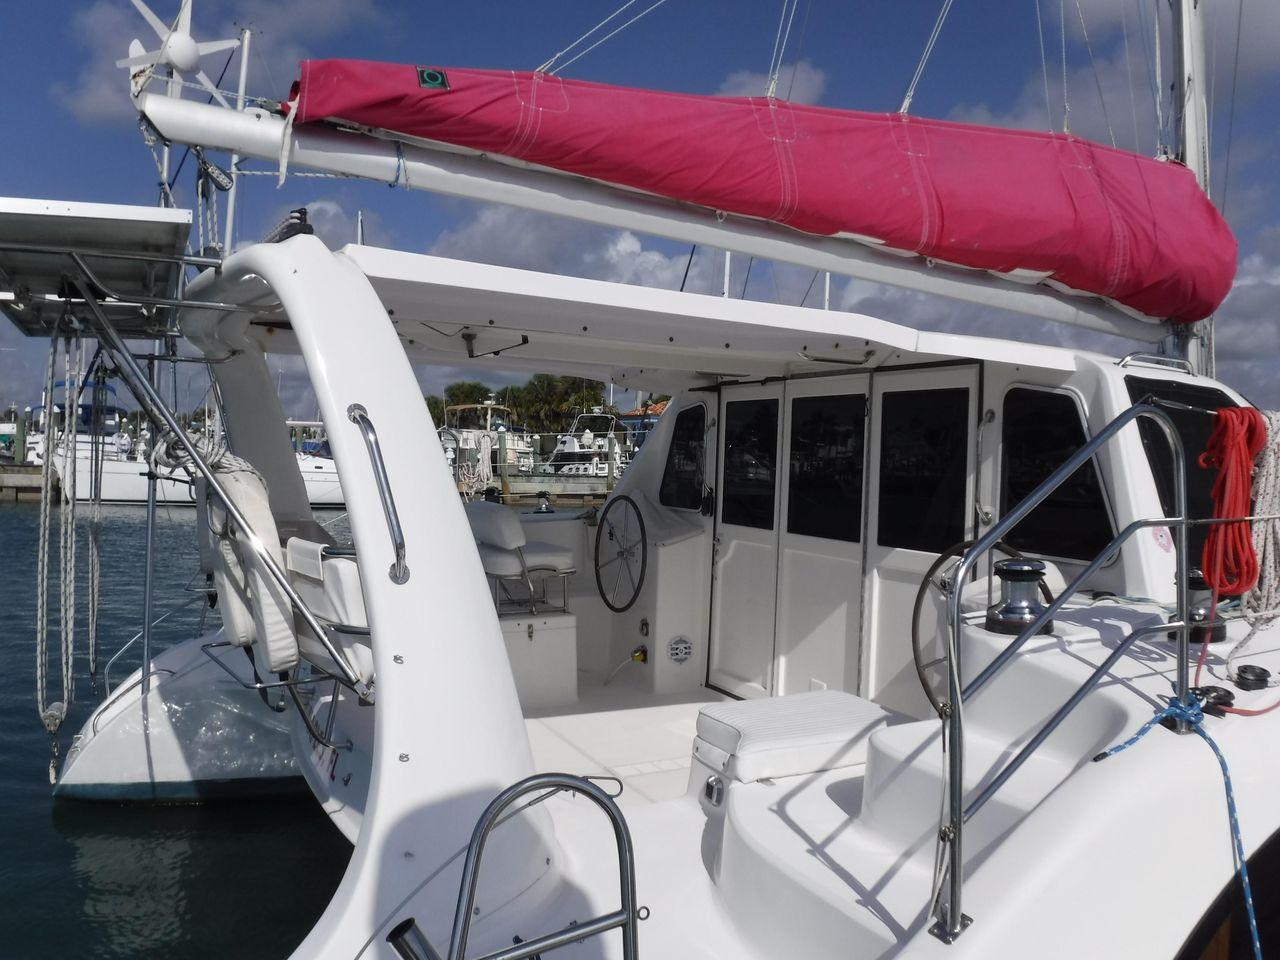 2005 Used Seawind 1160 Catamaran Sailboat For Sale - $274,900 - Fort